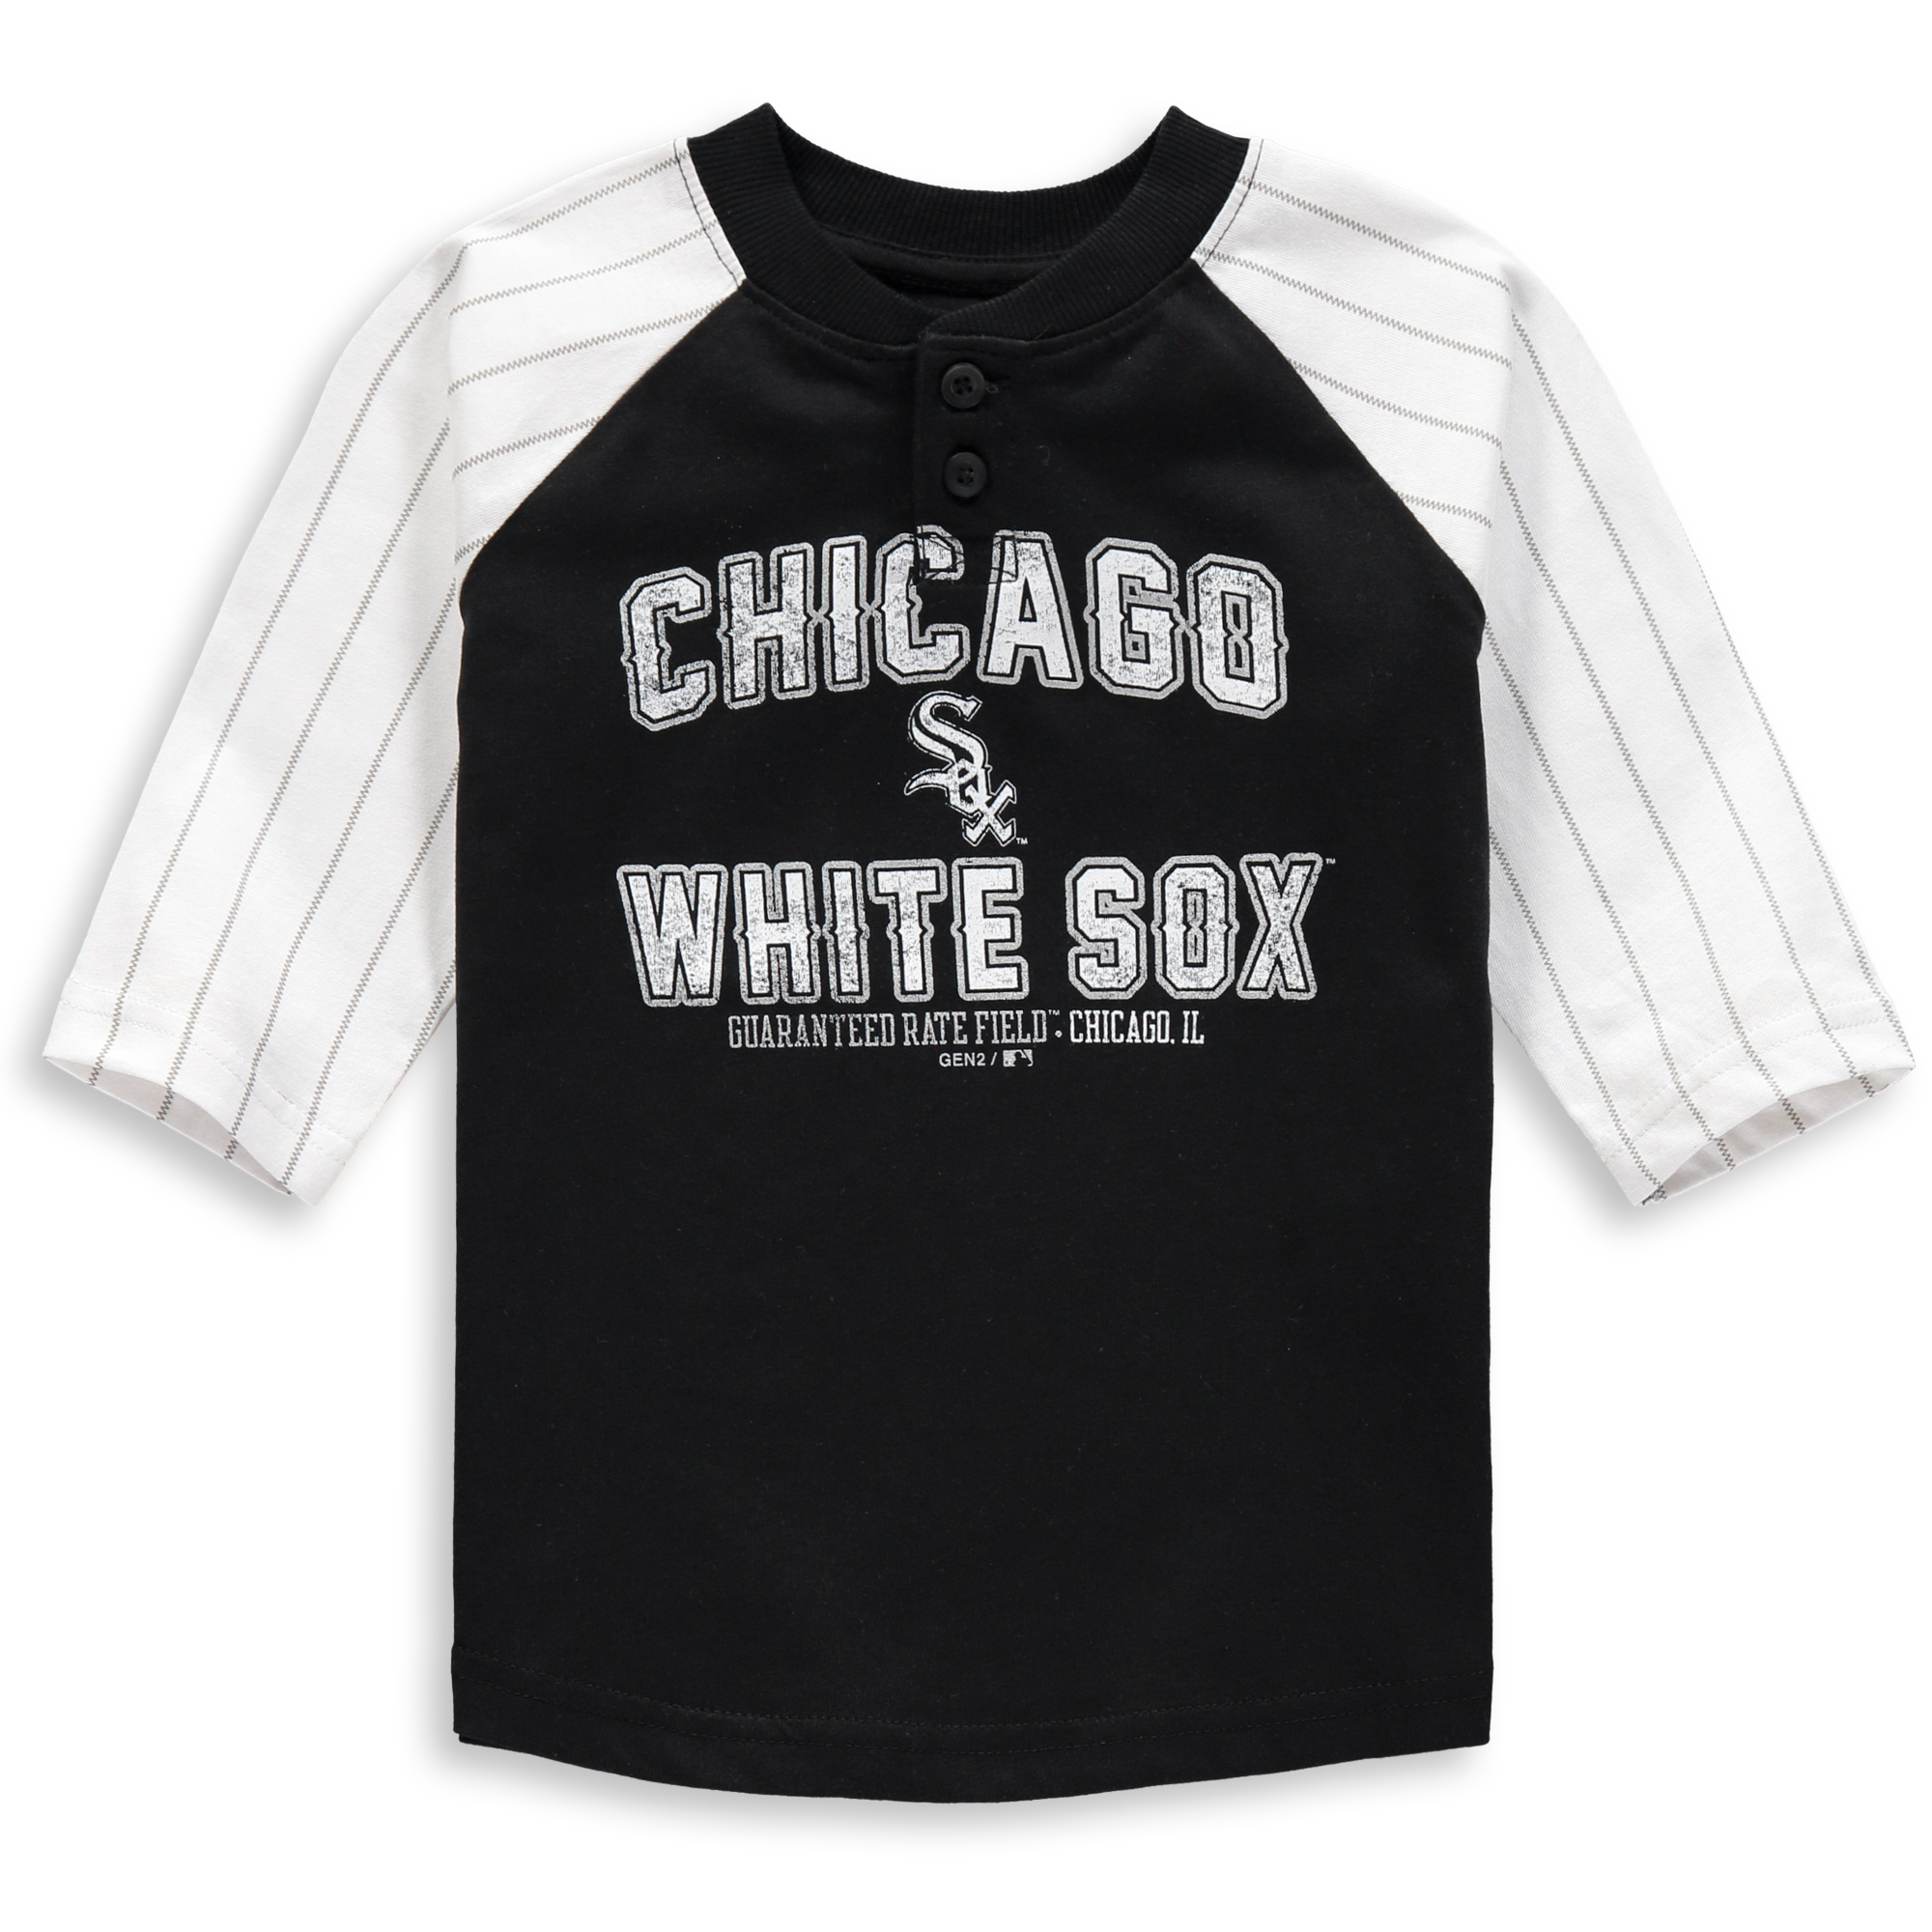 Chicago White Sox Toddler The Original 3/4-Sleeve T-Shirt - Black